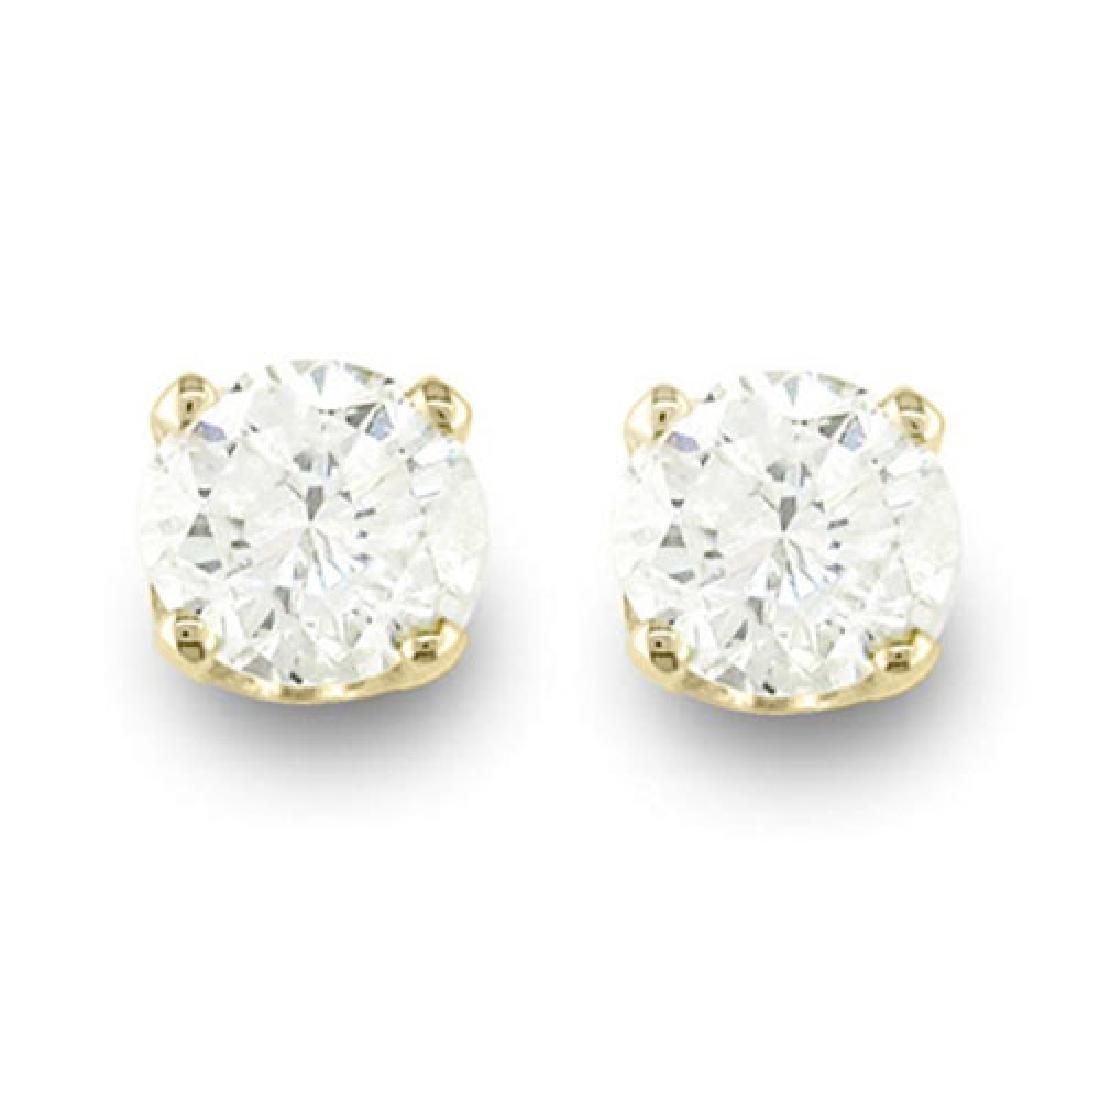 0.20 CTW VS/SI Diamond Solitaire Stud Earrings 14K - 2